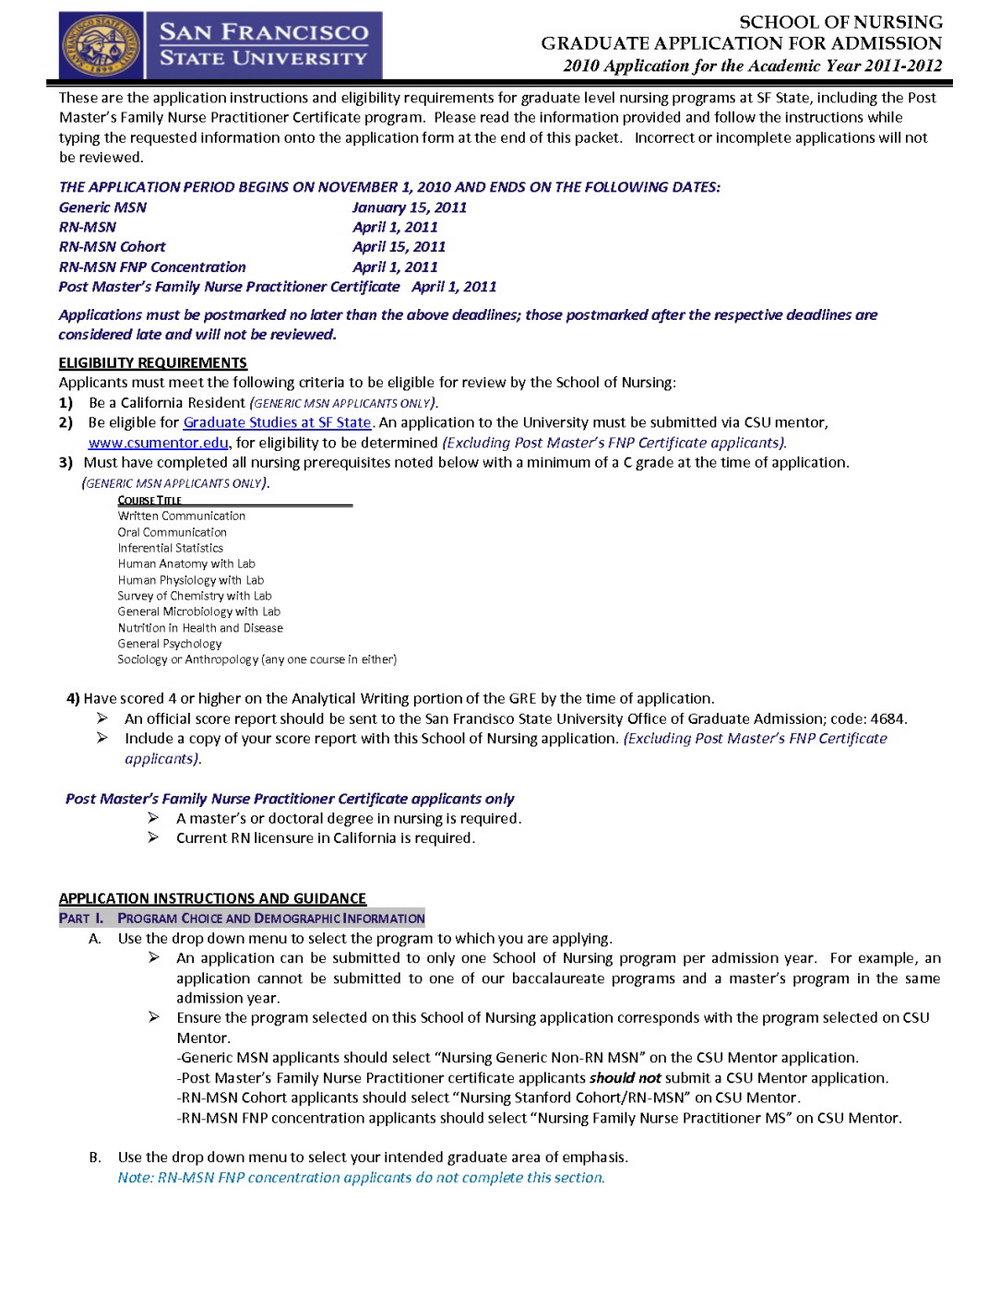 Nursing Job Application Personal Statement